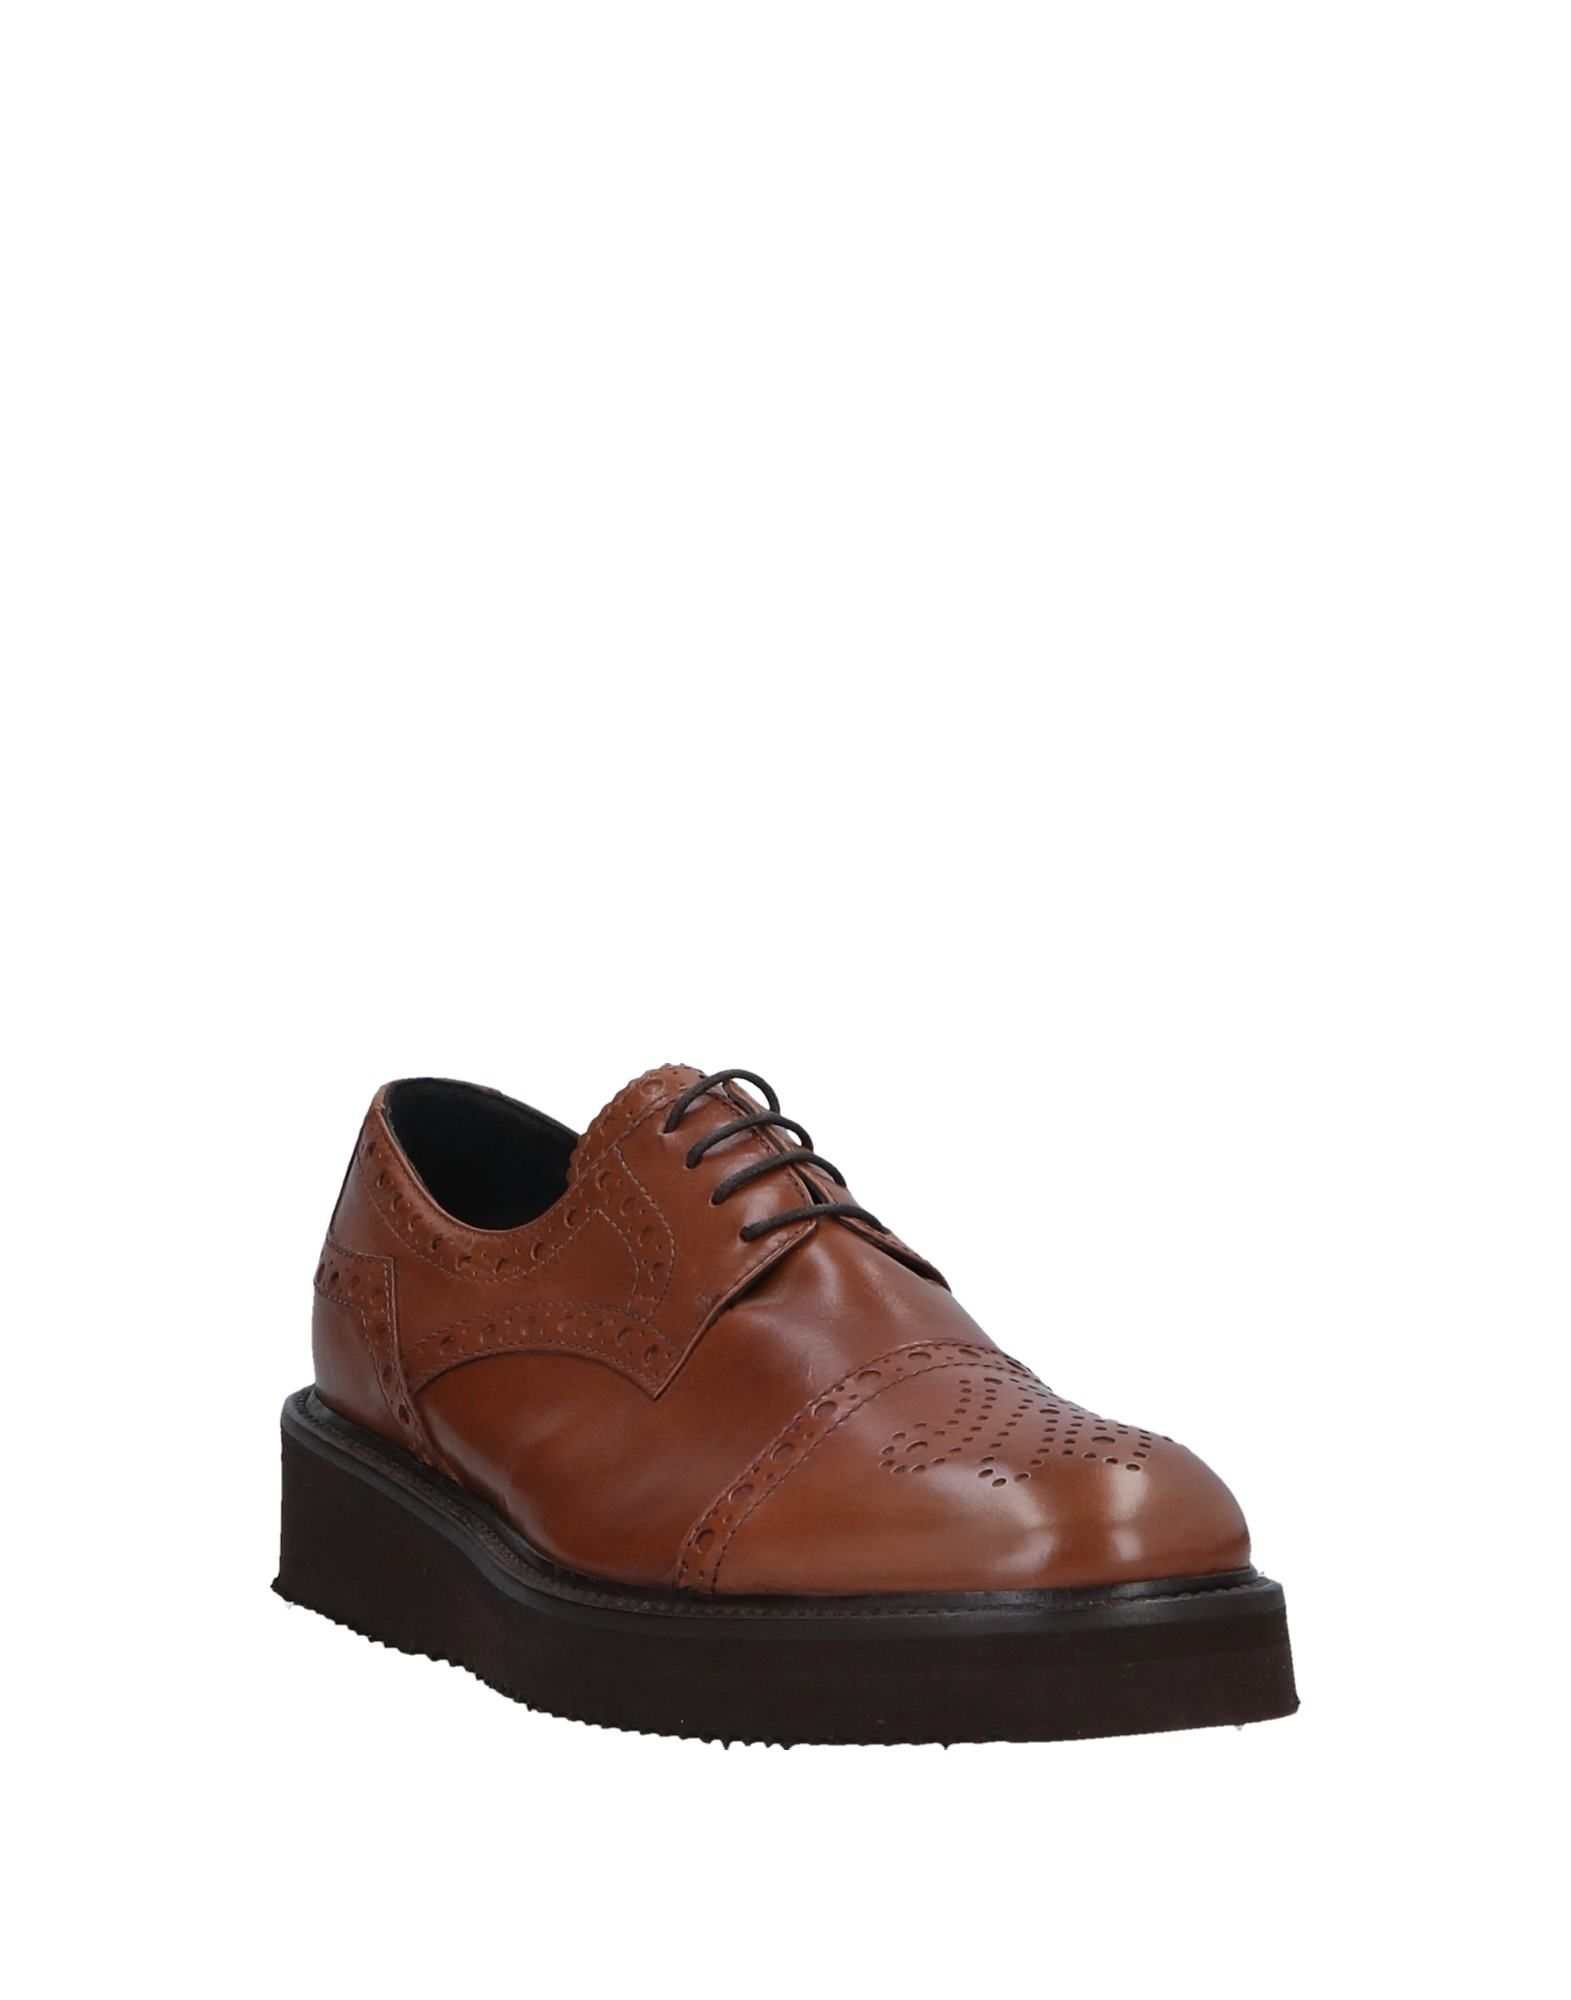 Stilvolle billige Schuhe Maria Cristina Schnürschuhe Damen  11518056IF